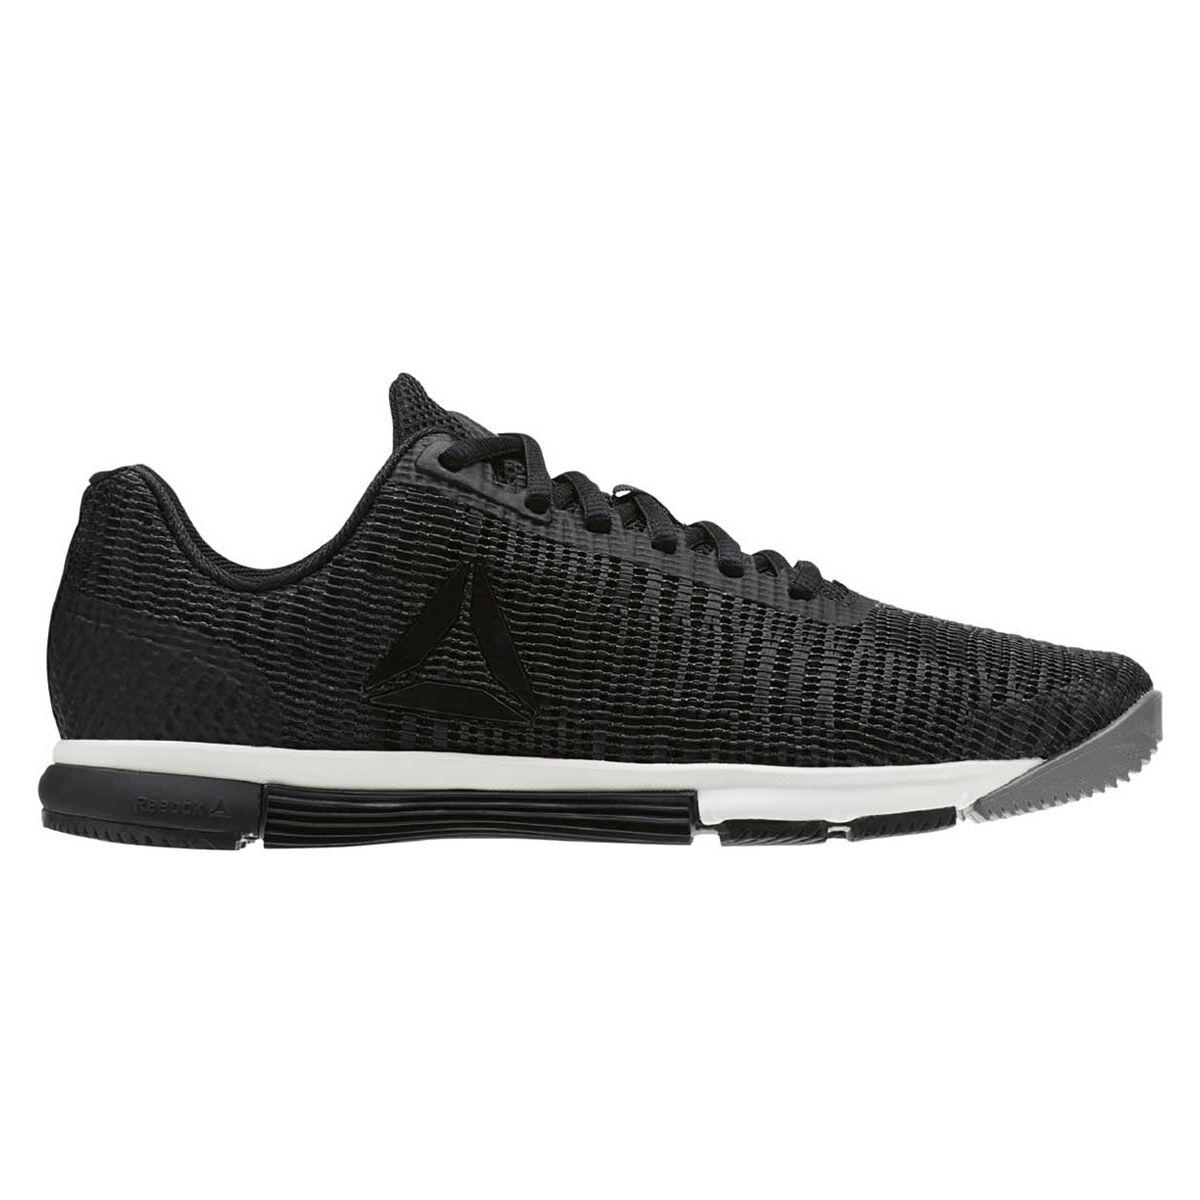 adidas Men's Speed Trainer 3 Training Shoes BlackWhite